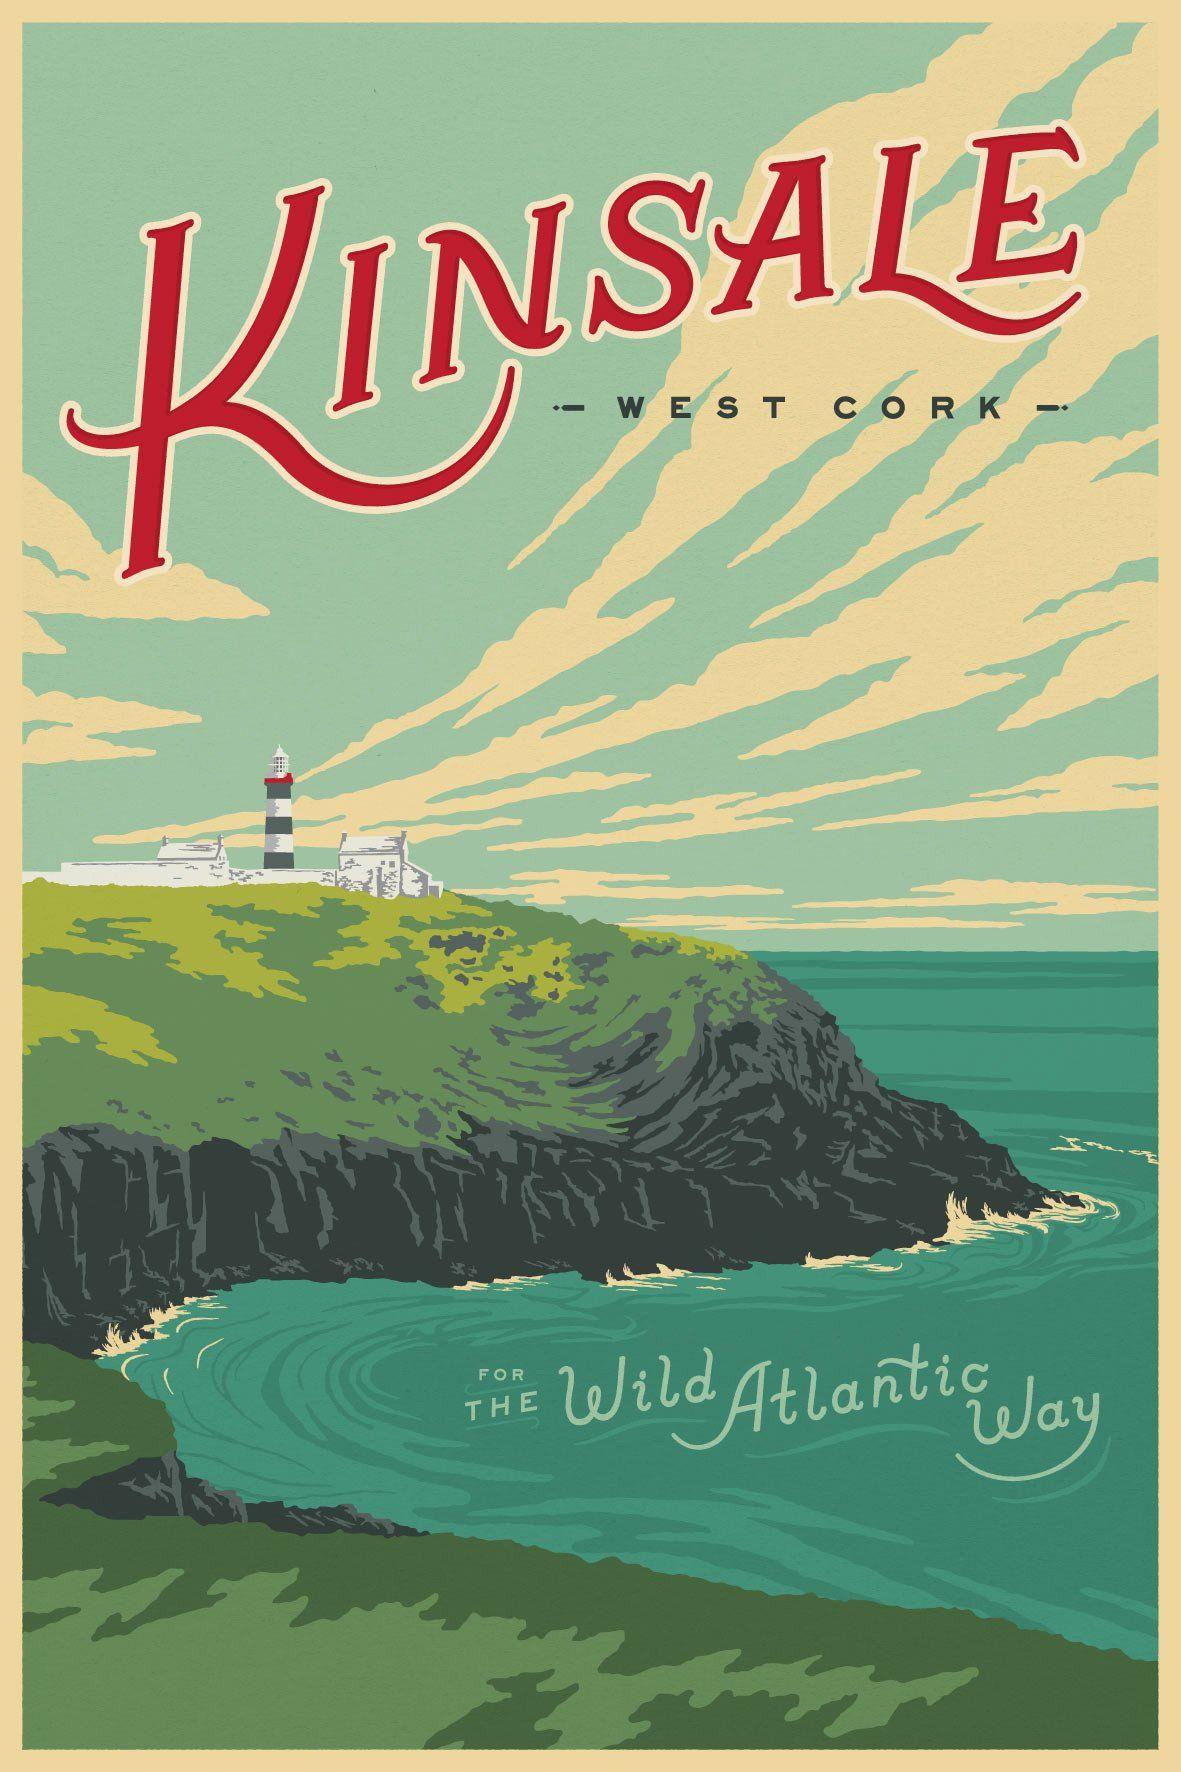 Ireland Land of Romance vintage travel poster repro 16x24